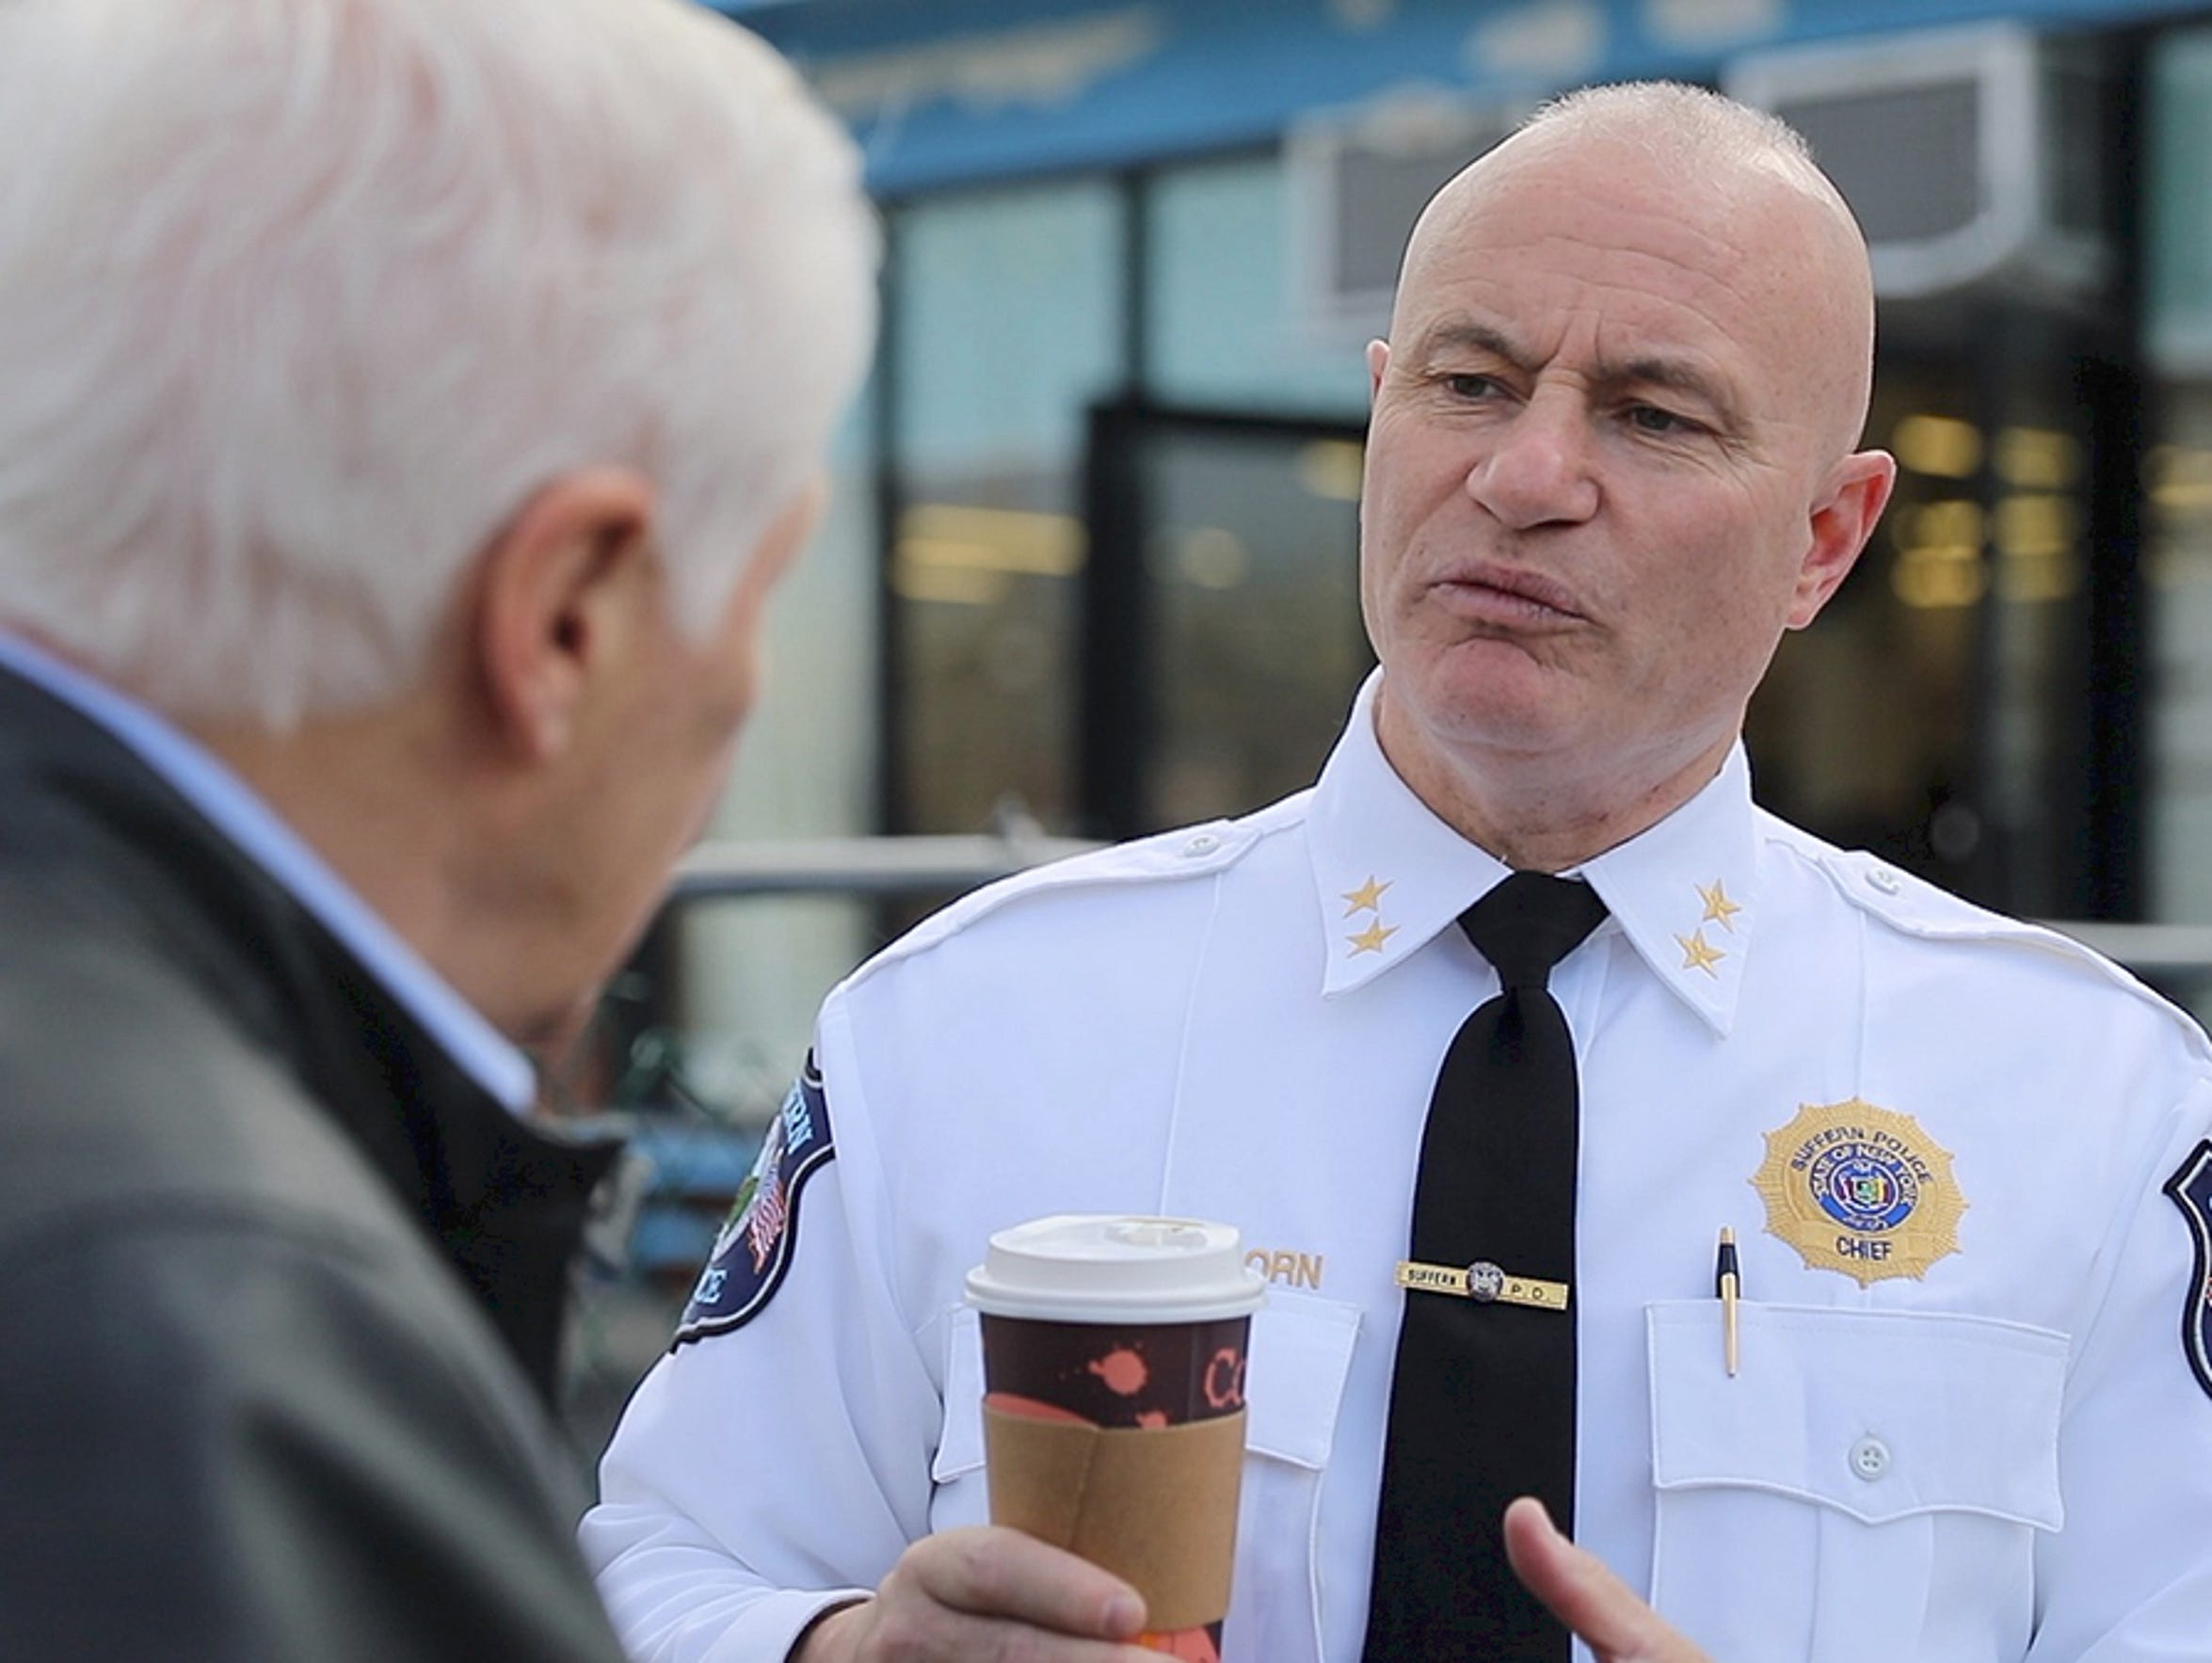 Suffern Police Chief Clarke Osborn, right, talks with